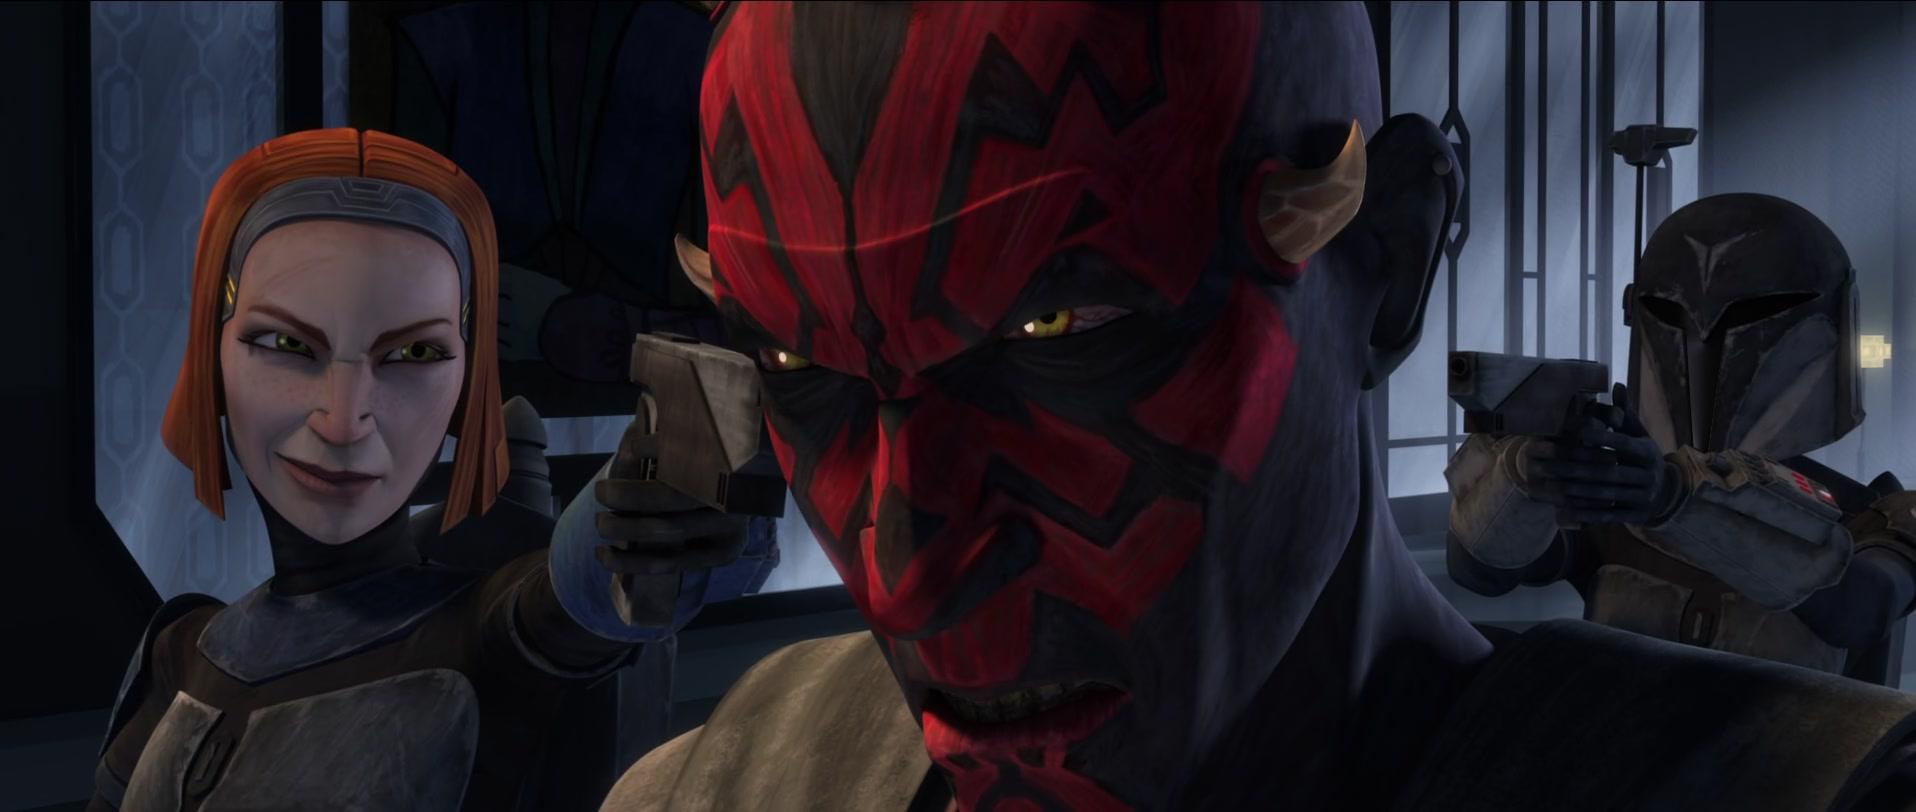 star wars series the clone wars s5e15 shades of reason bo-katan kryze maul